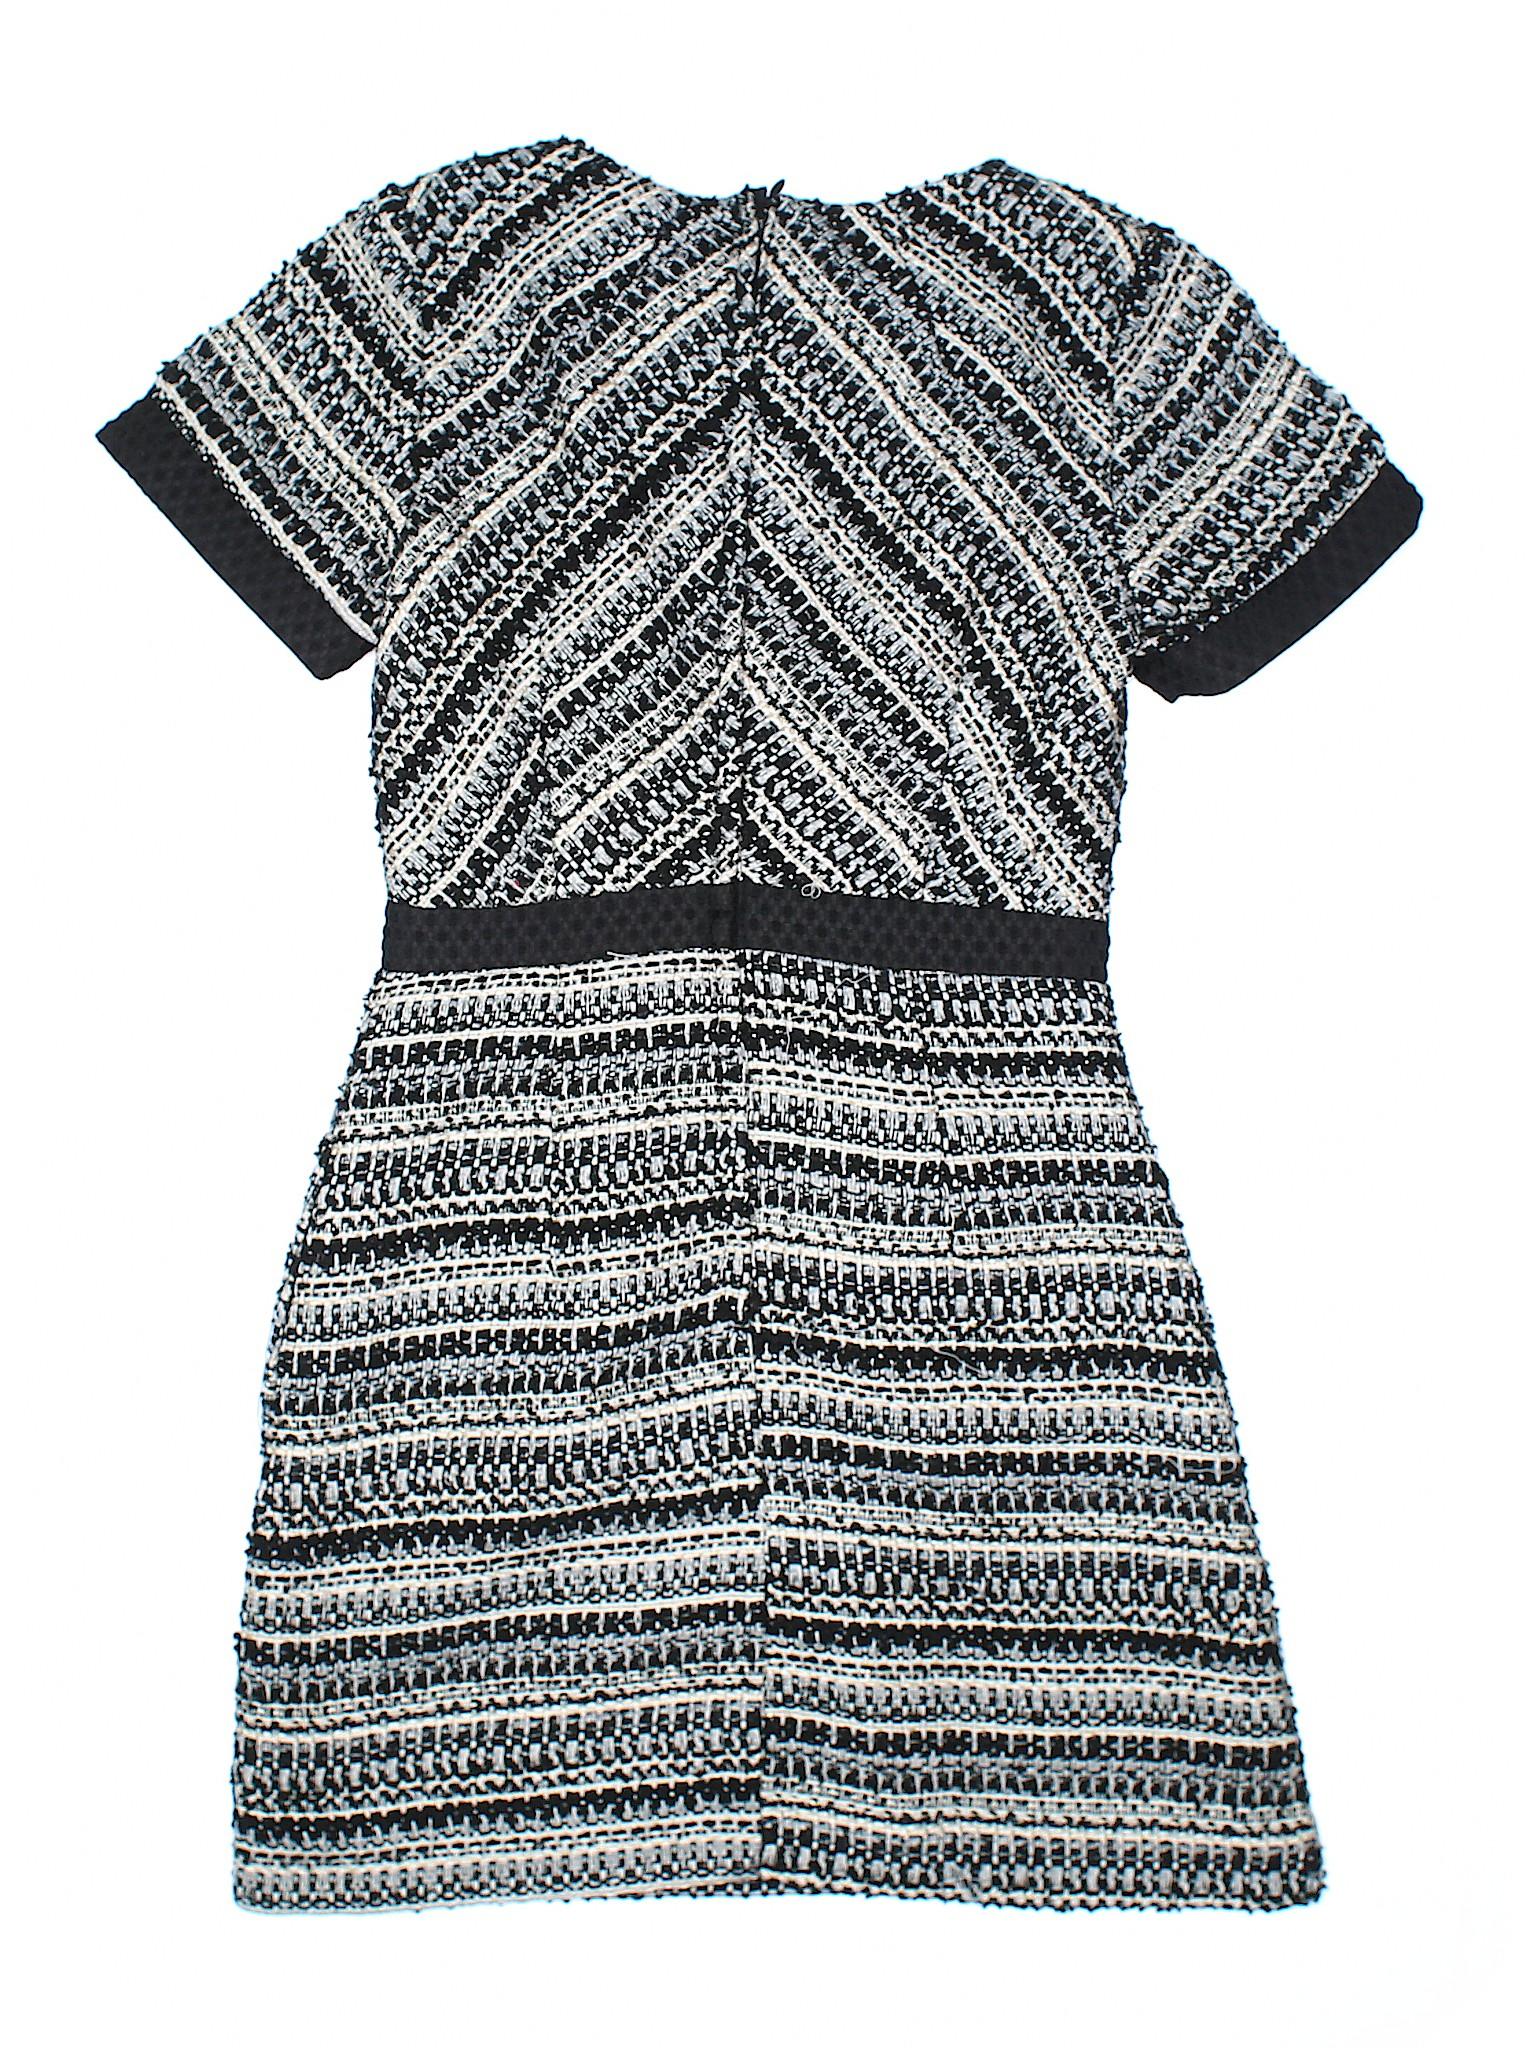 Boutique Dress H winter Casual amp;M rzFOxwUrq